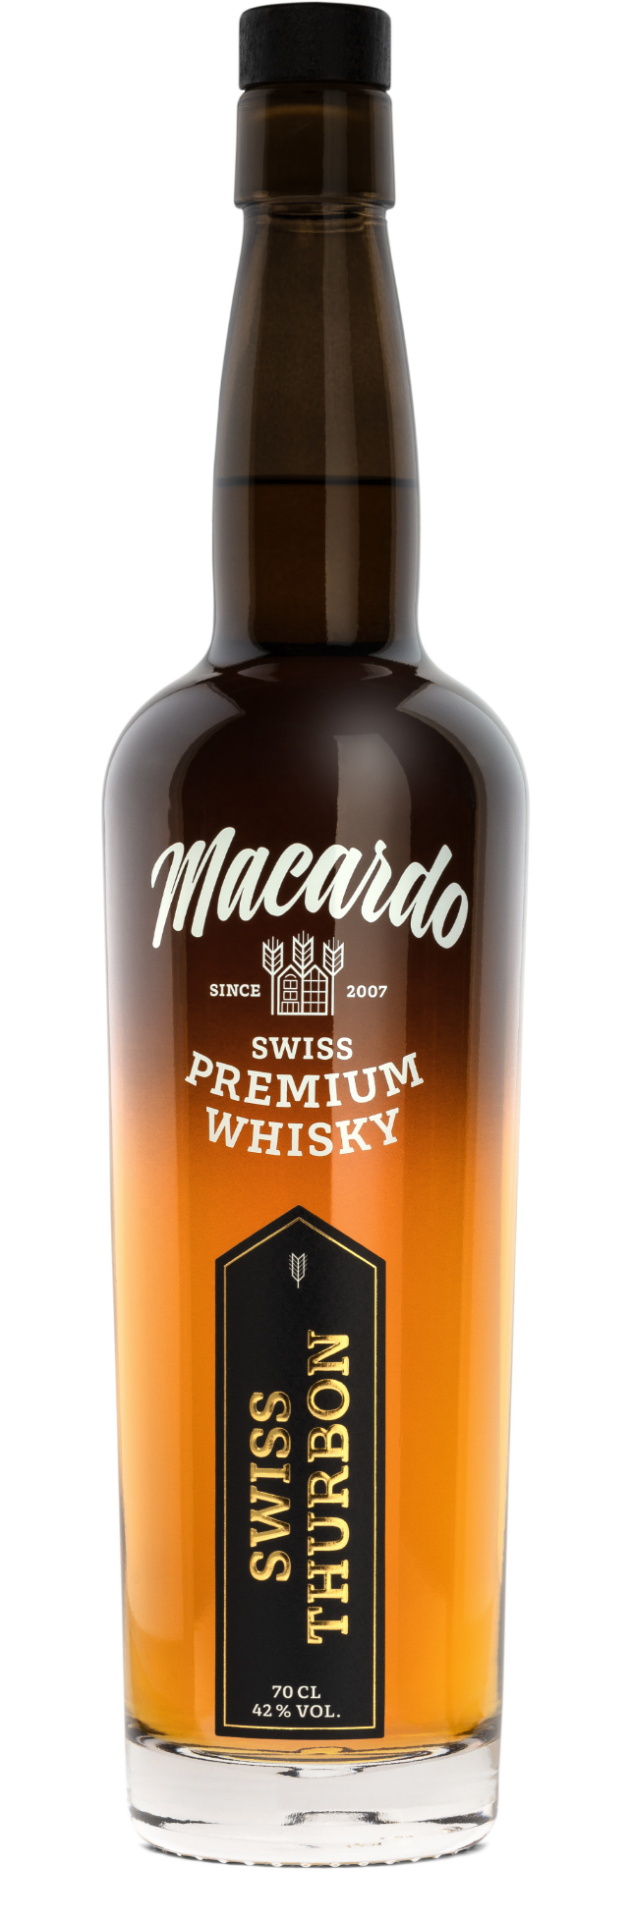 Macardo Swiss Thurbon